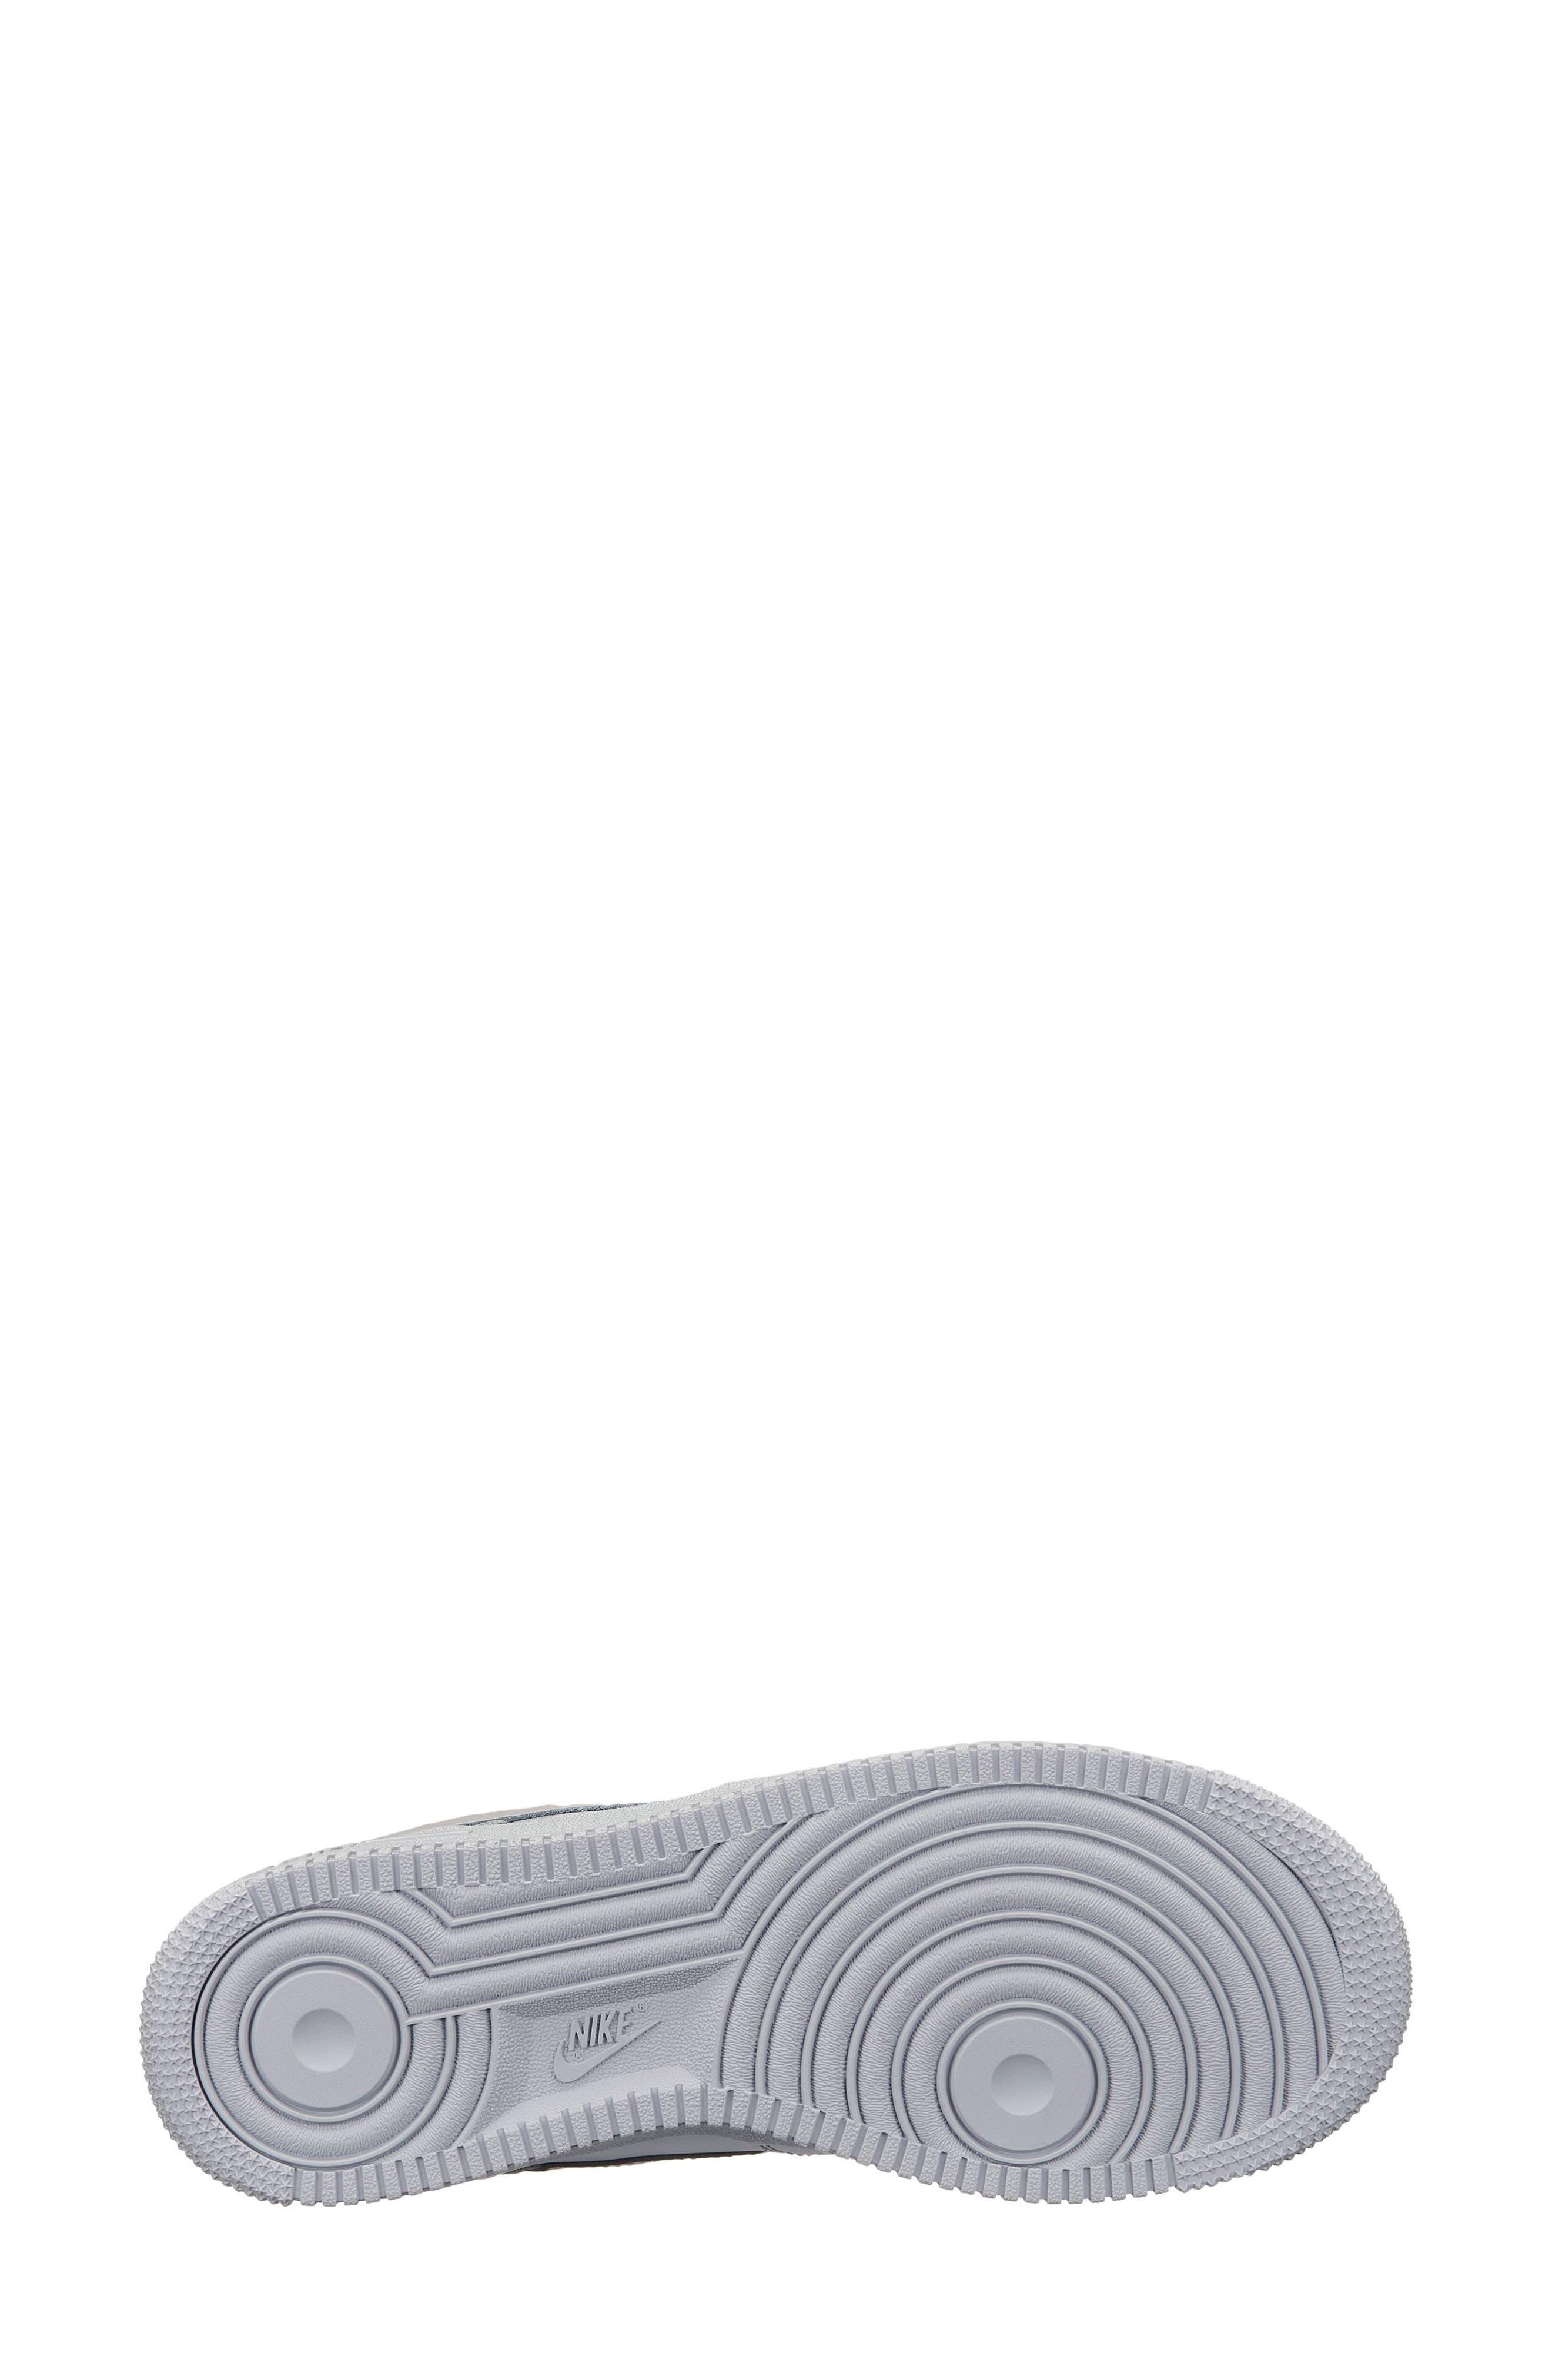 NIKE,                             Air Force 1 '07 LX Sneaker,                             Alternate thumbnail 2, color,                             METALLIC PLATINUM/ GOLD